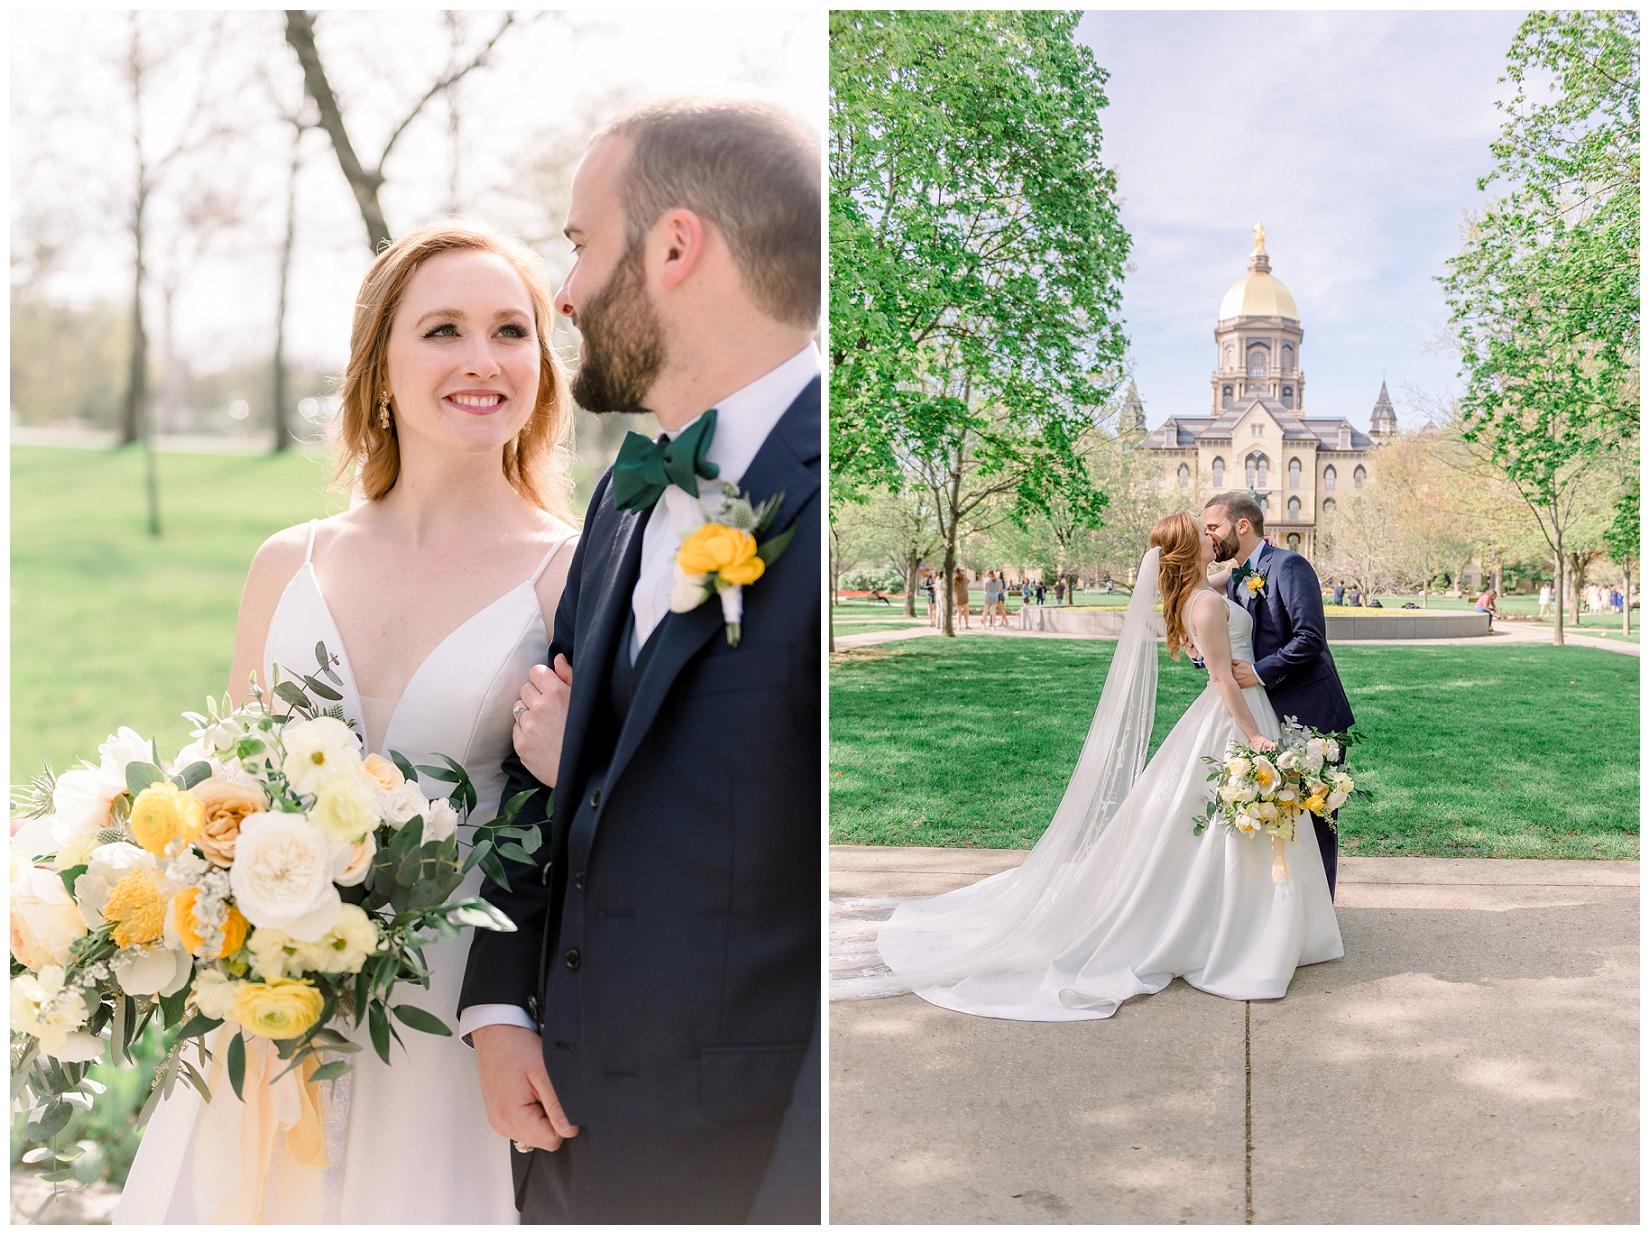 cat-alkire-wedding-photographer-indiana-chicago-indianapolis-fort-wayne_1212.jpg